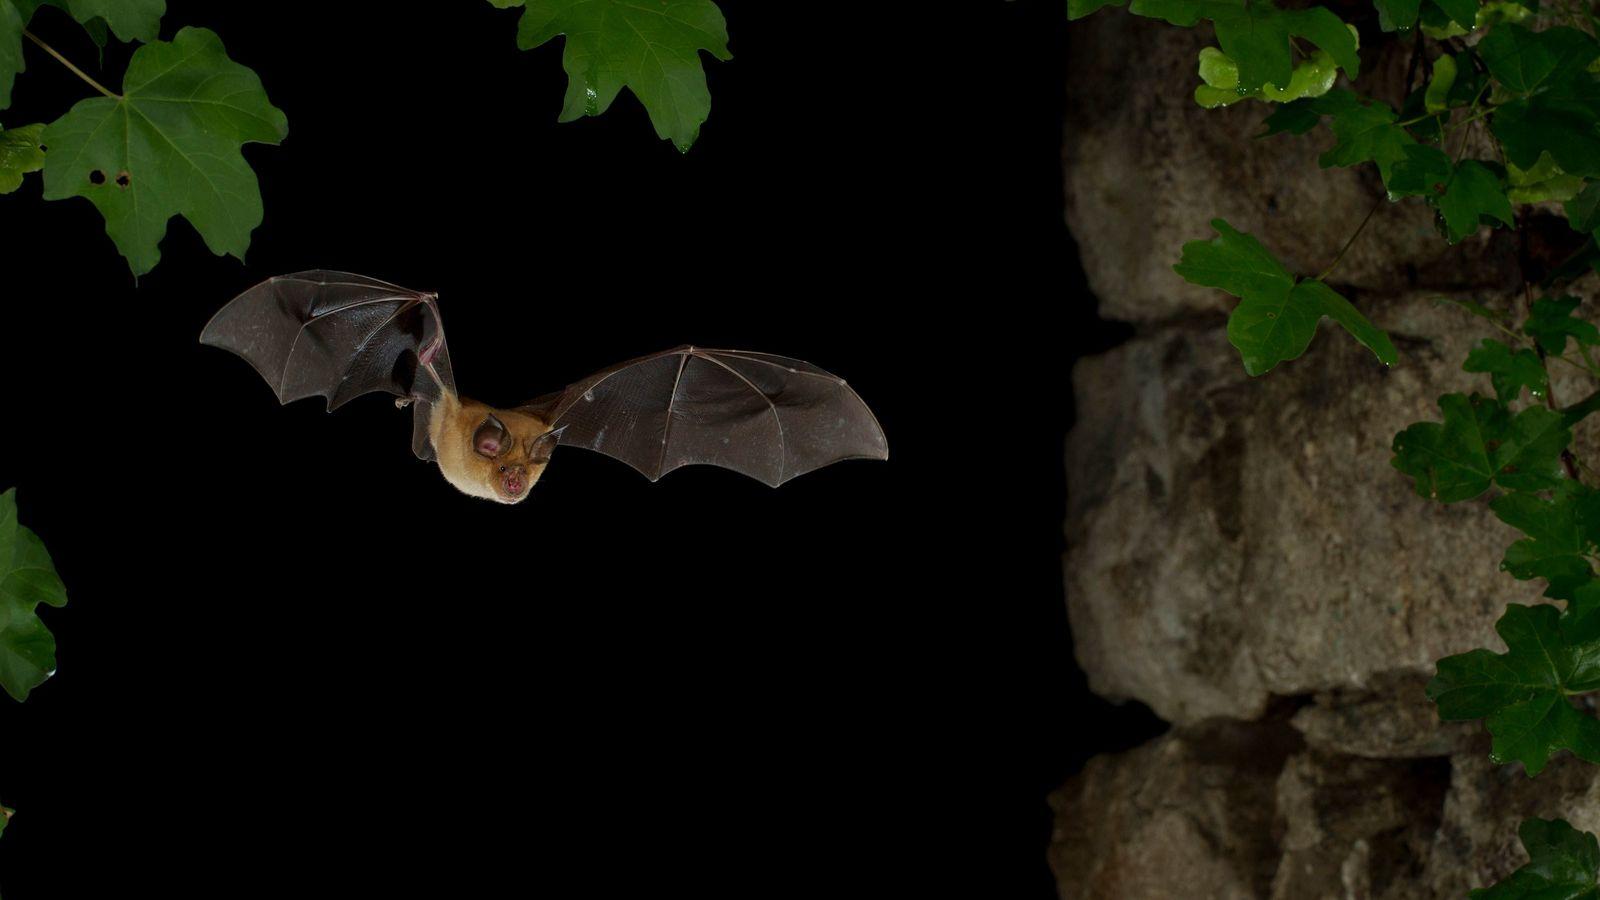 Mediterranean Horseshoe Bat (Rhinolophus Euryale) in flight, North Bulgaria. Bats are so associated with this area ...